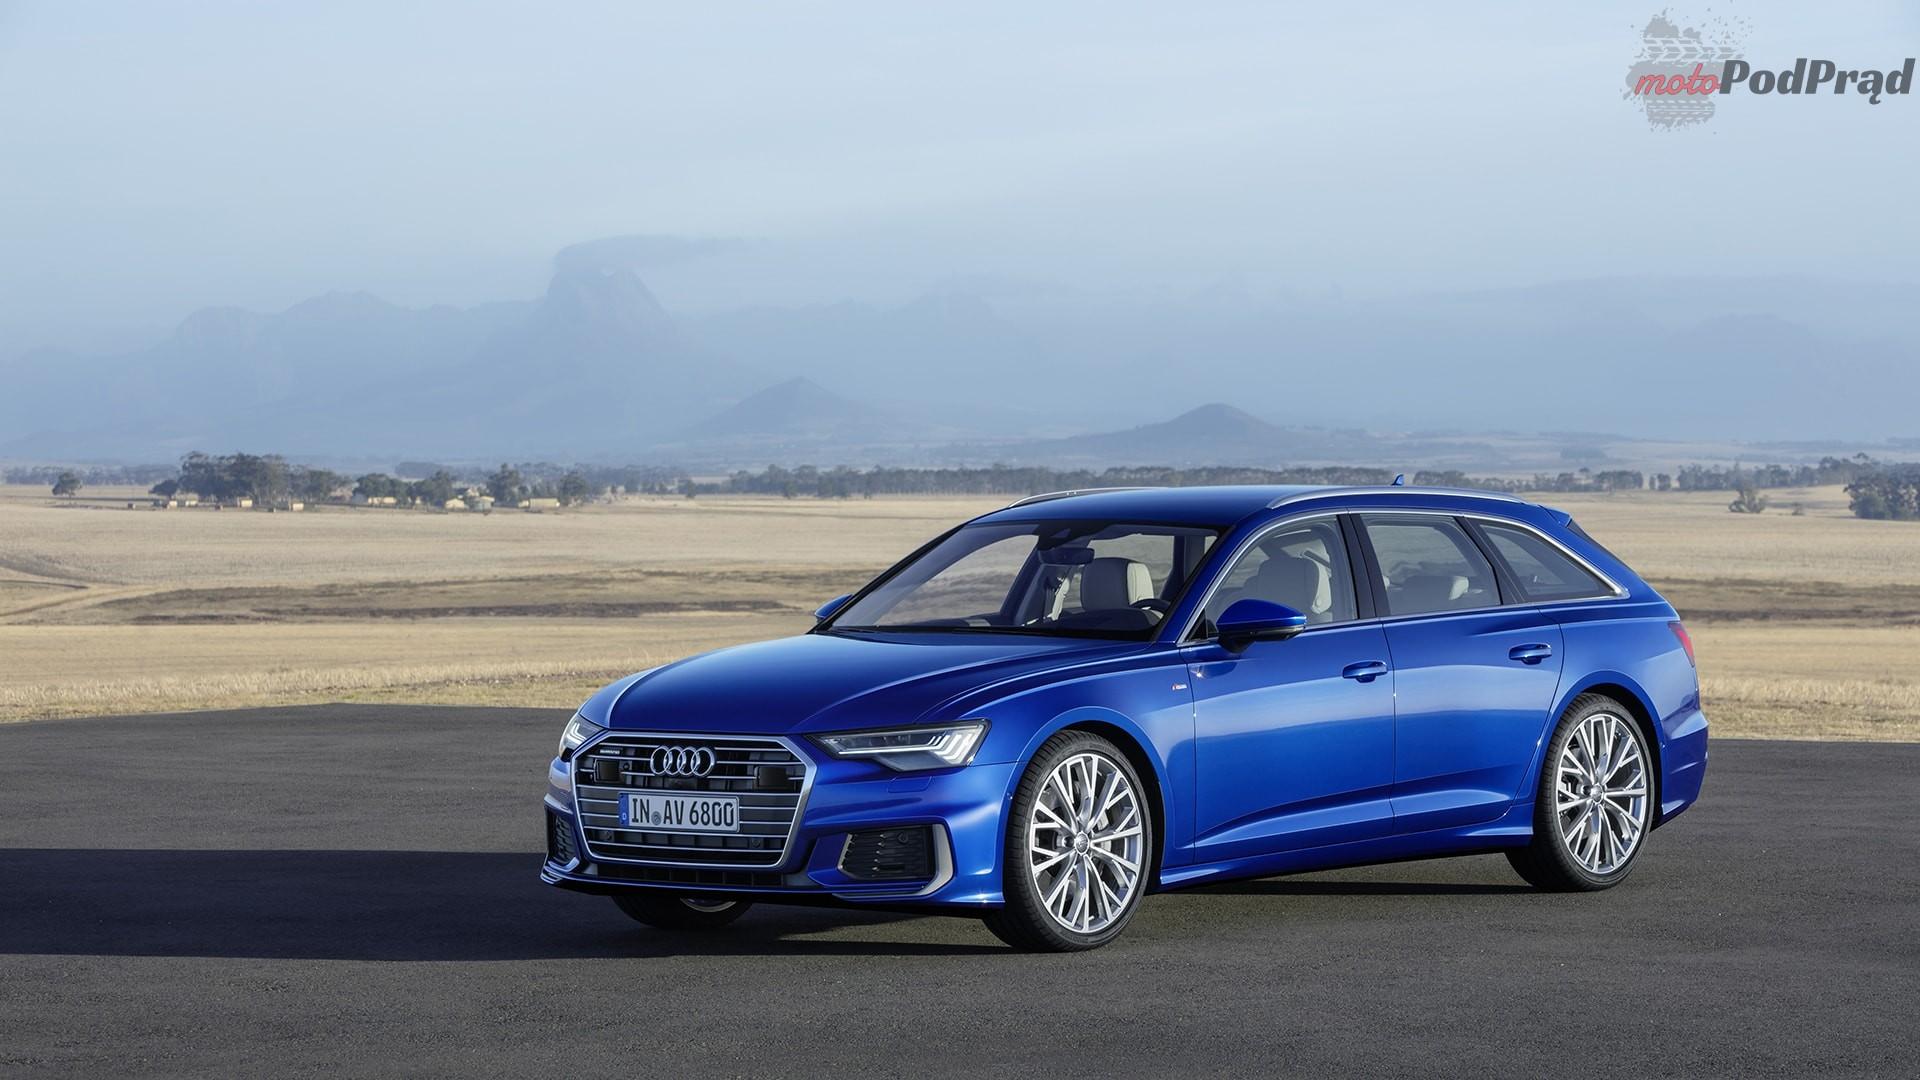 audi a6 avant 2019 10 Audi prezentuje nowe A6 Avant